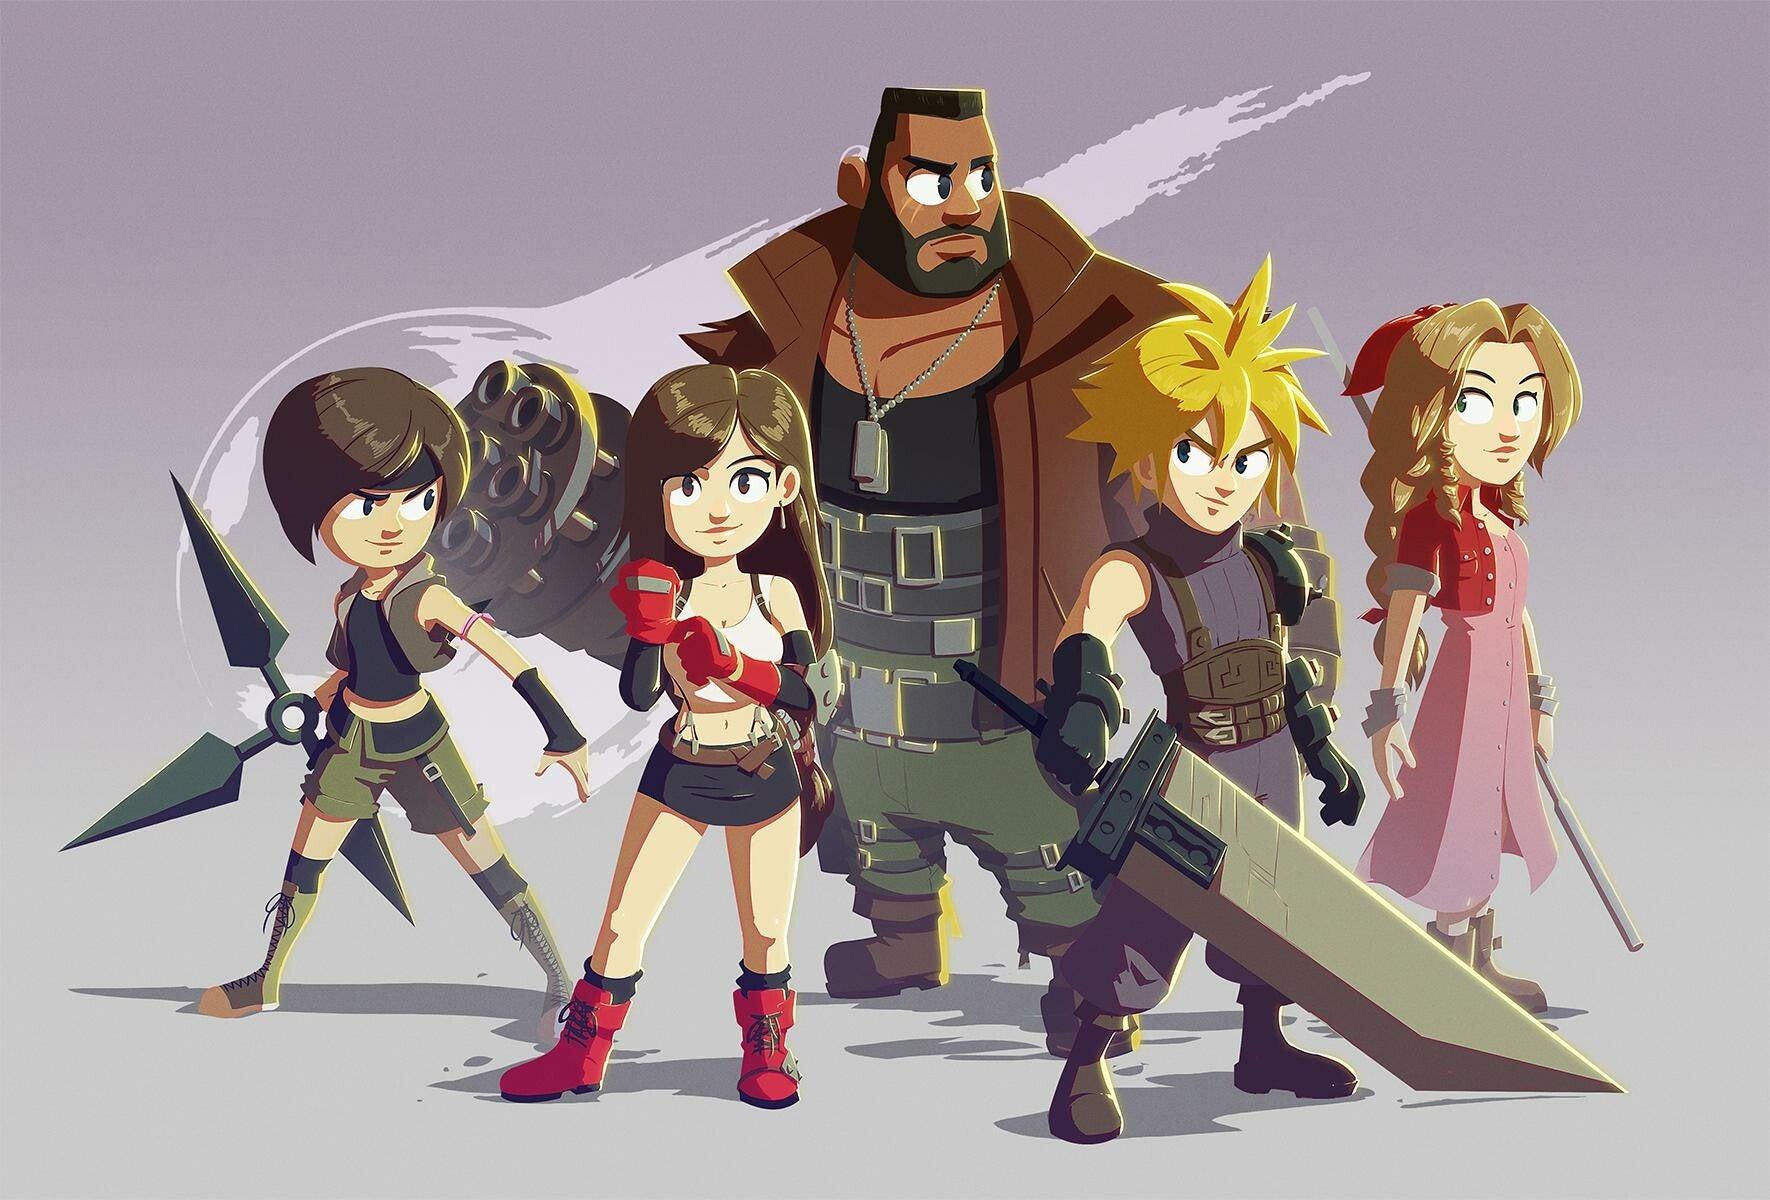 A Final Fantasy VII Bedtime Story